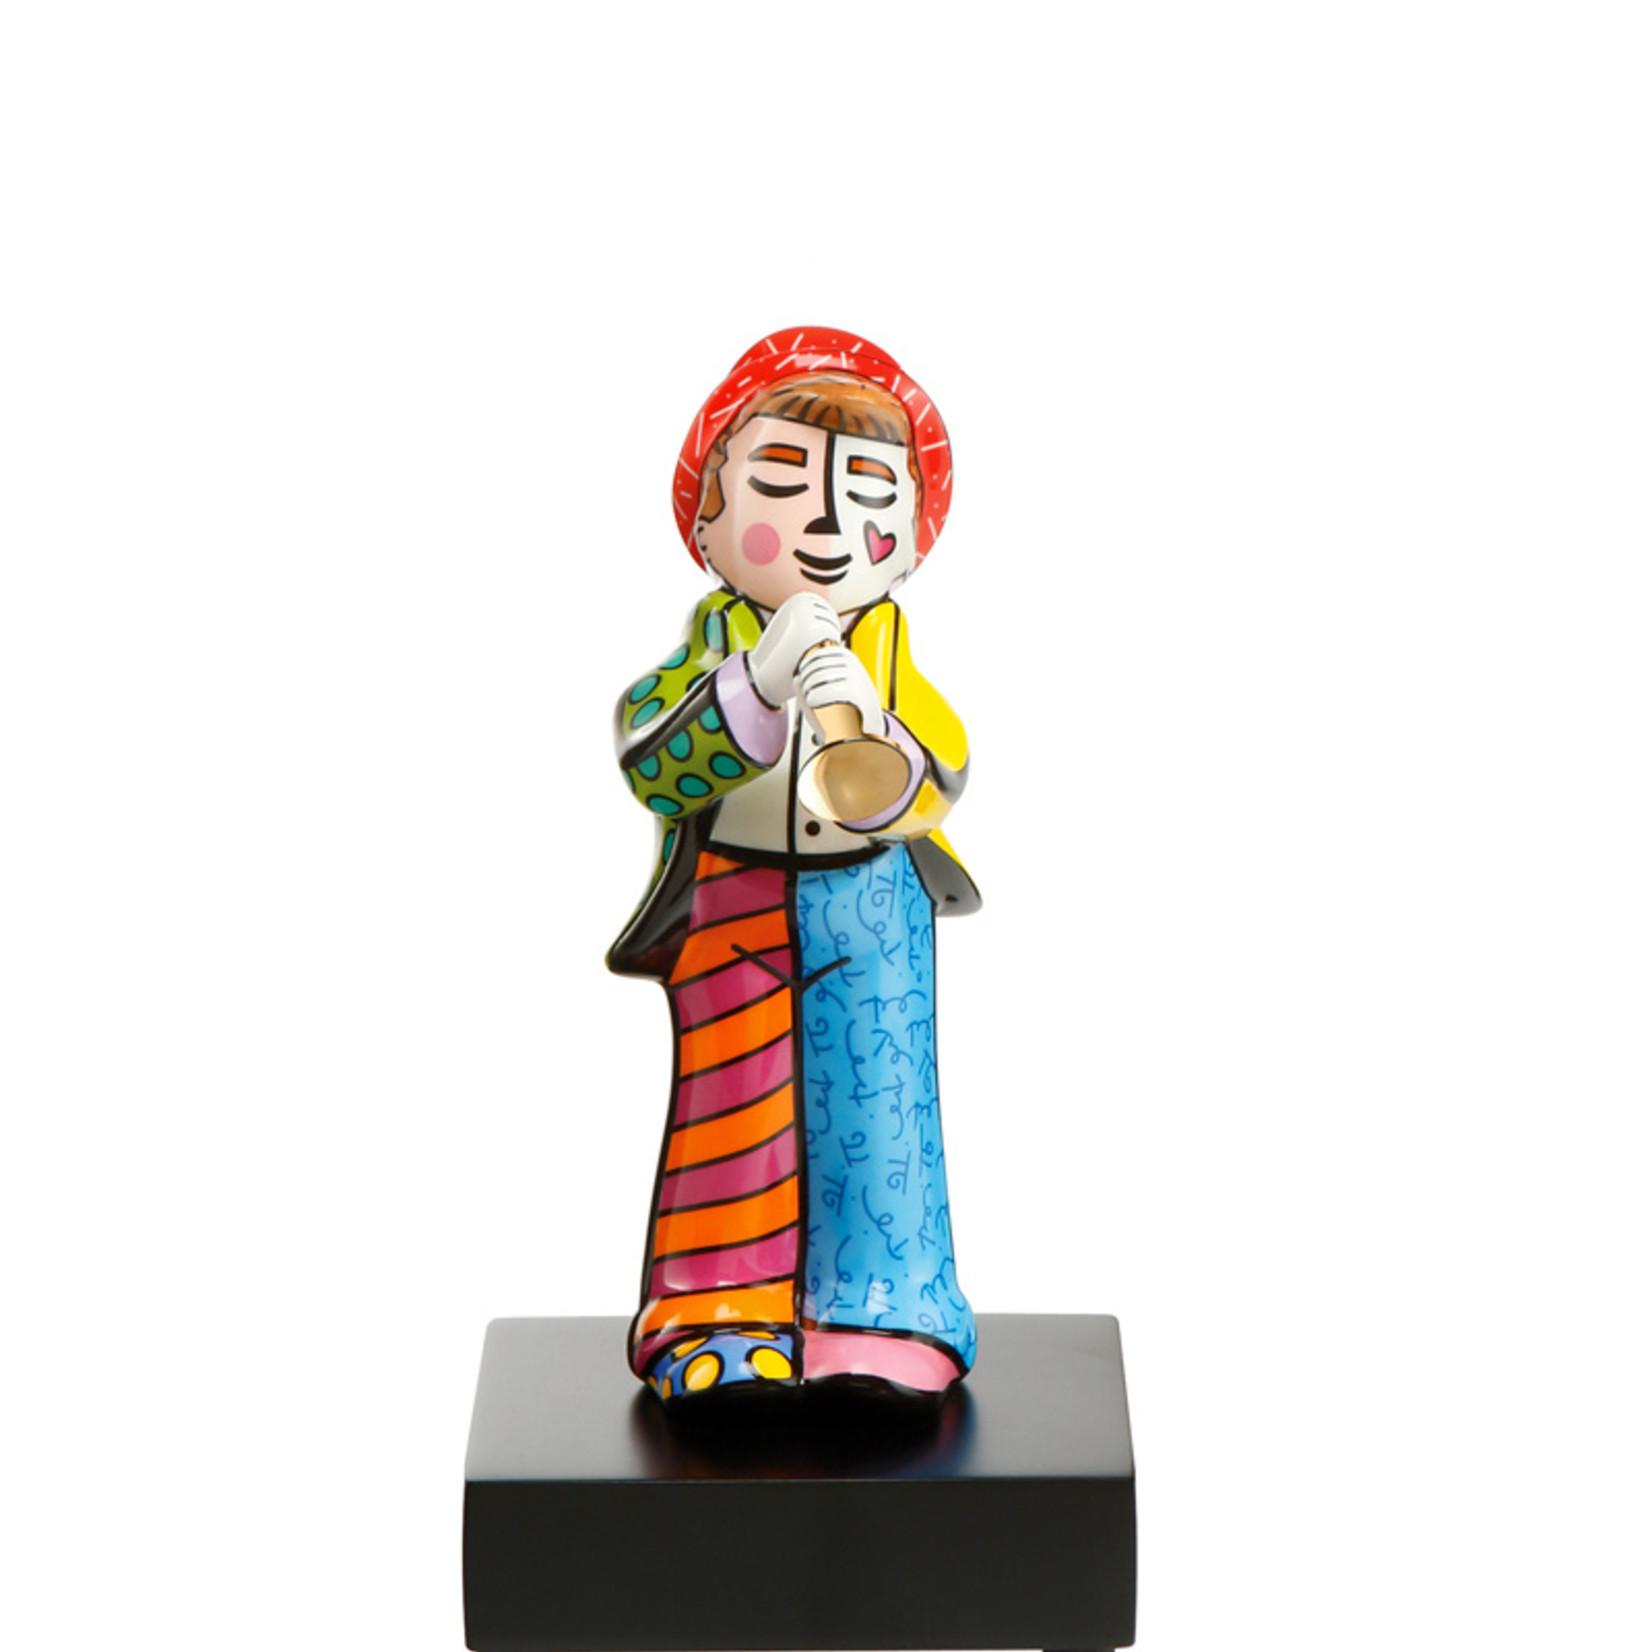 Goebel Porzellanmanufaktur Figur Trompeter   Romero Britto   Goebel Porzellan